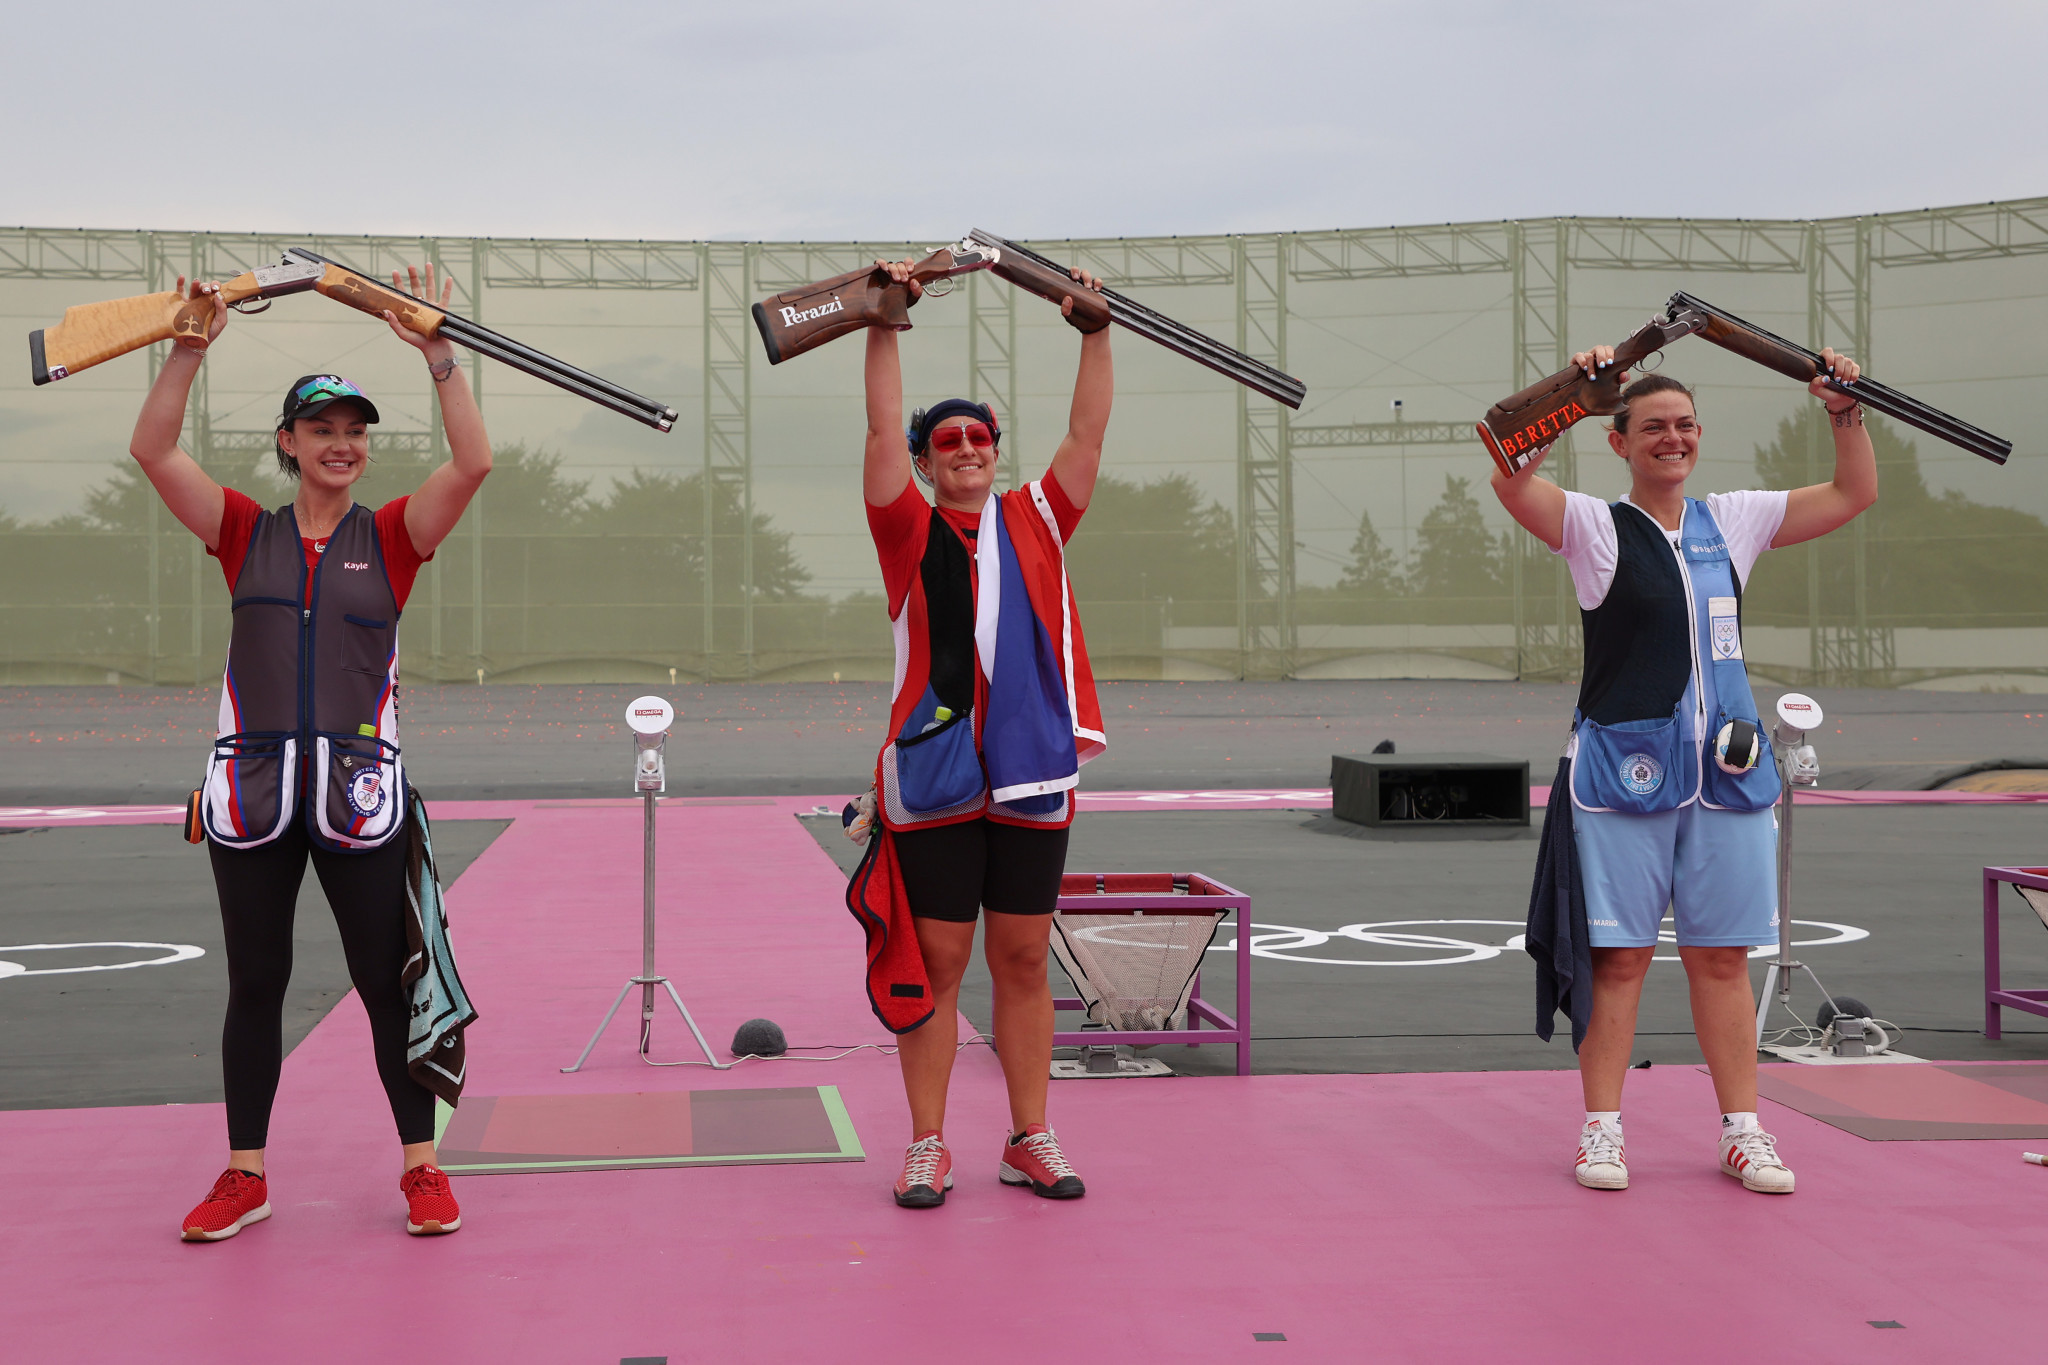 Štefečeková and Liptak claim trap shooting golds at Tokyo 2020